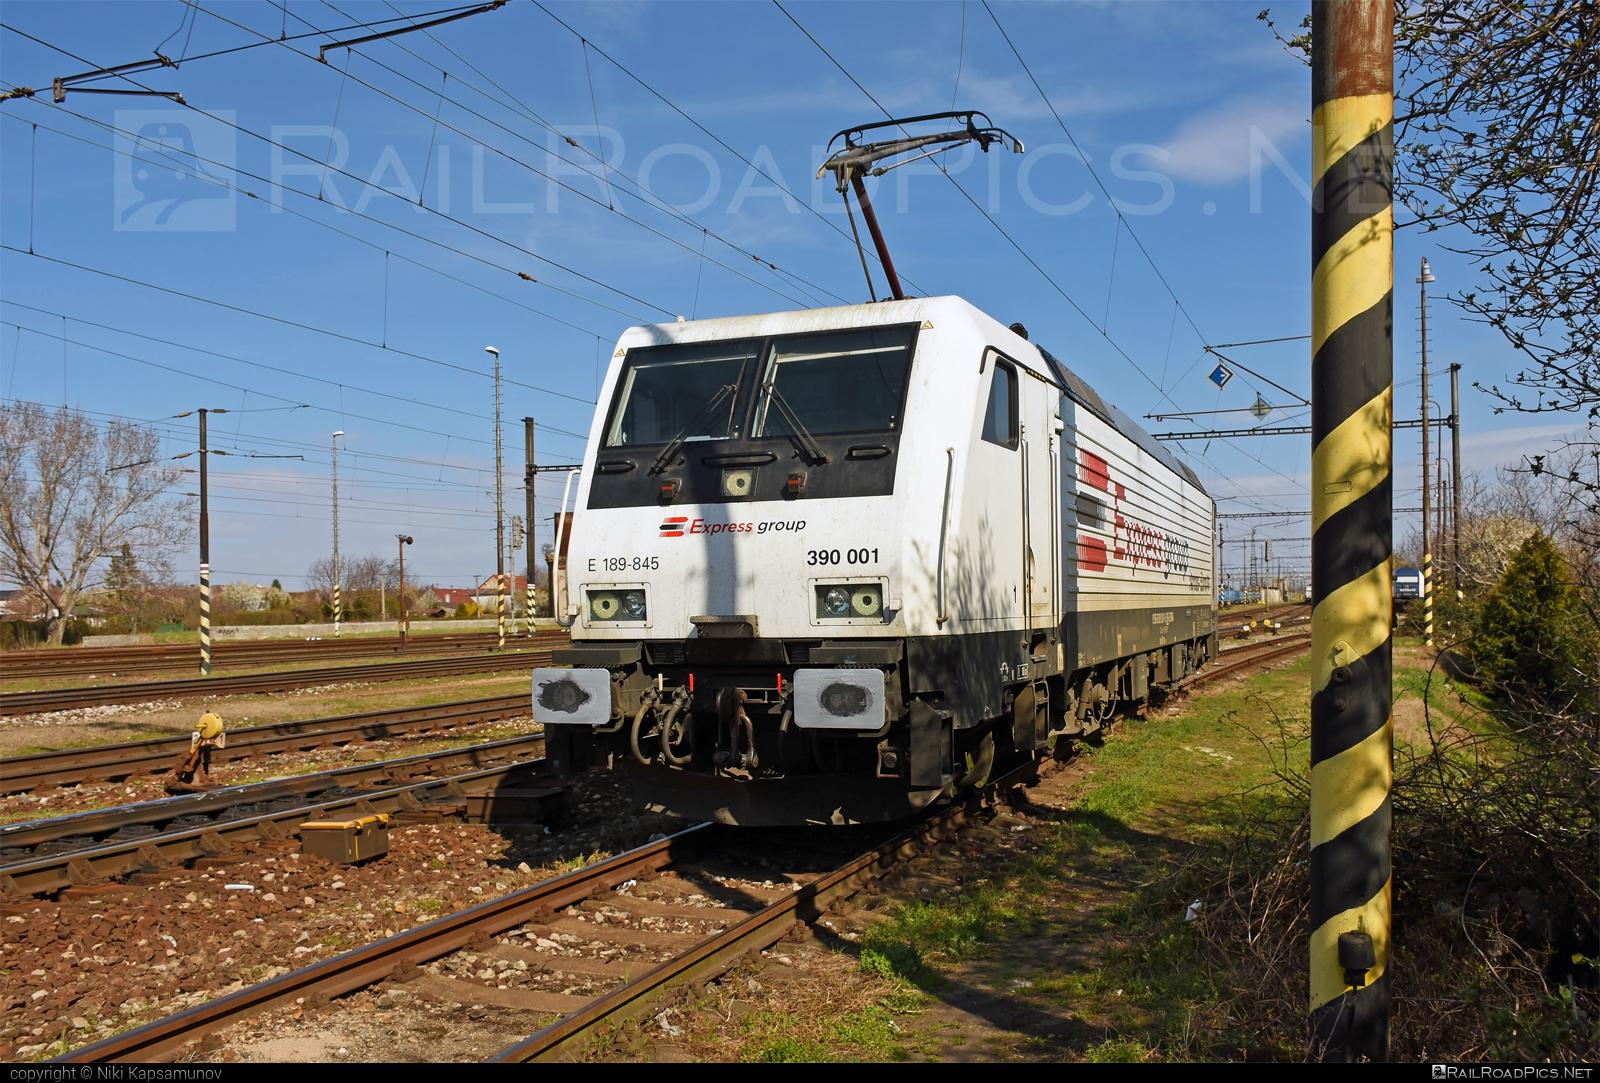 Siemens ES 64 F4 - 390 001 operated by METRANS Rail s.r.o. #ExpressWagons #ExpressWagonsAS #es64 #es64f4 #eurosprinter #expressgroup #exra #hhla #metrans #metransrail #siemens #siemenses64 #siemenses64f4